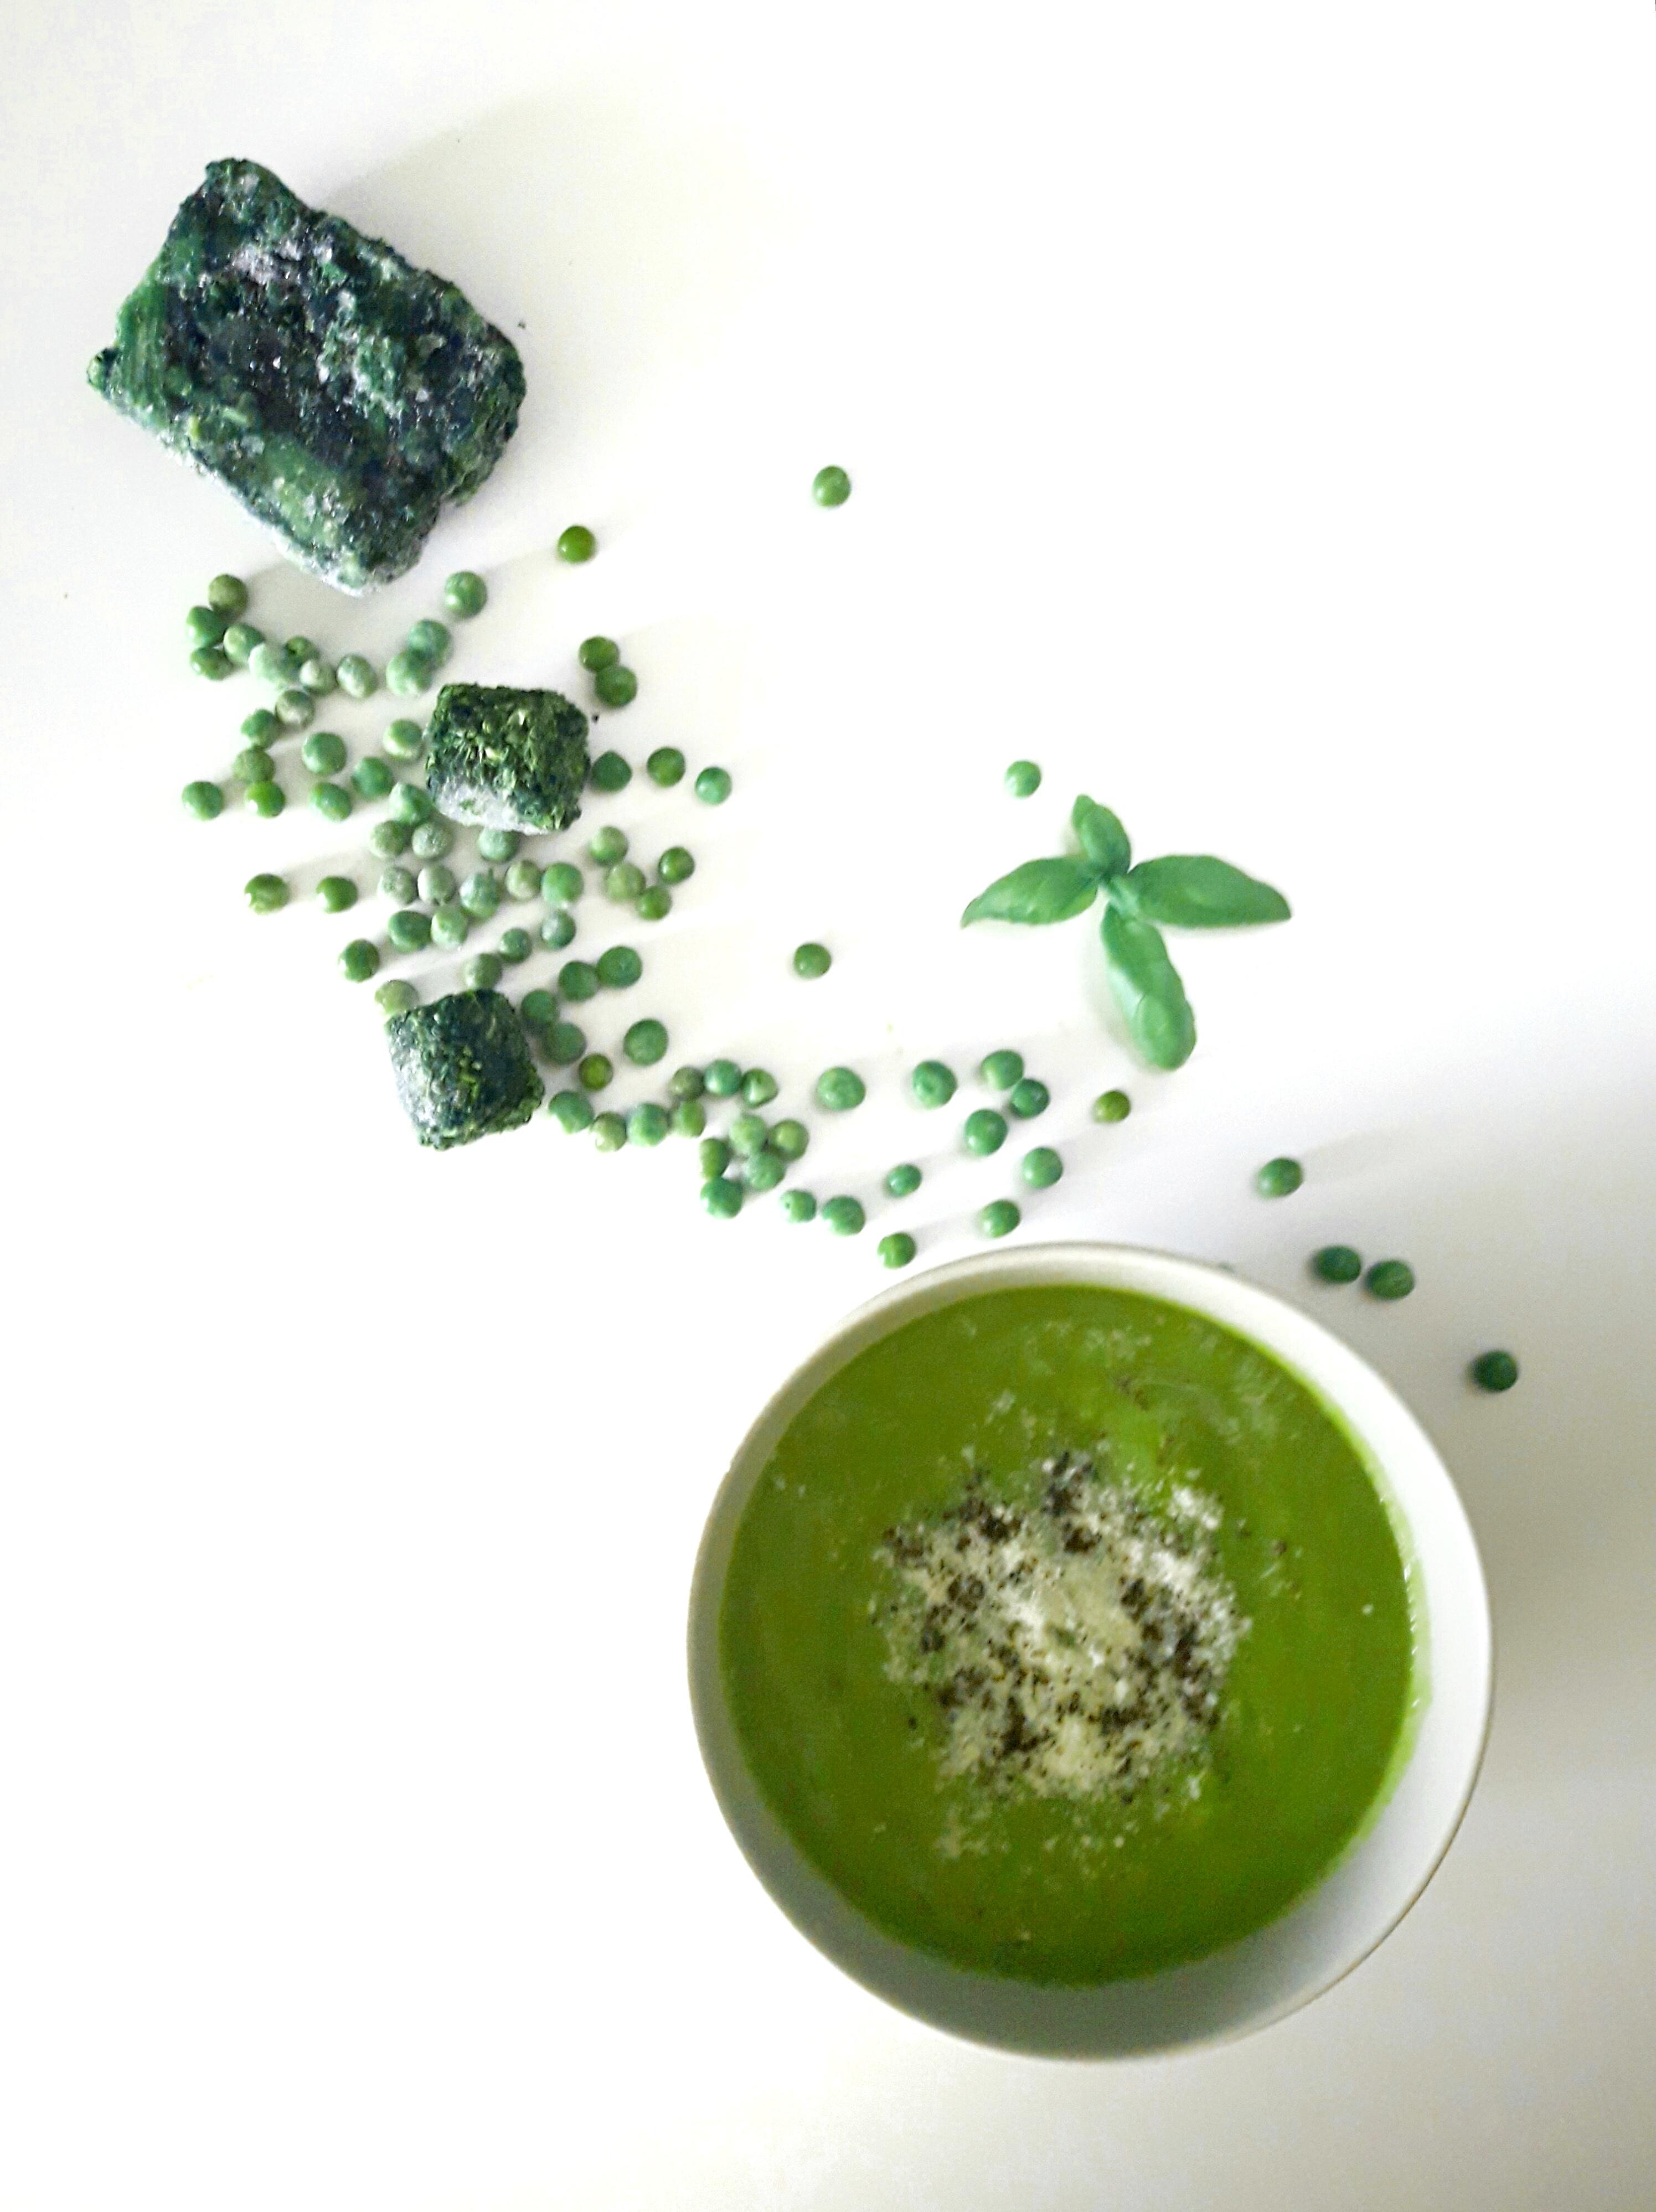 Zupa krem z zielonych resztek – mega prosta i szybka